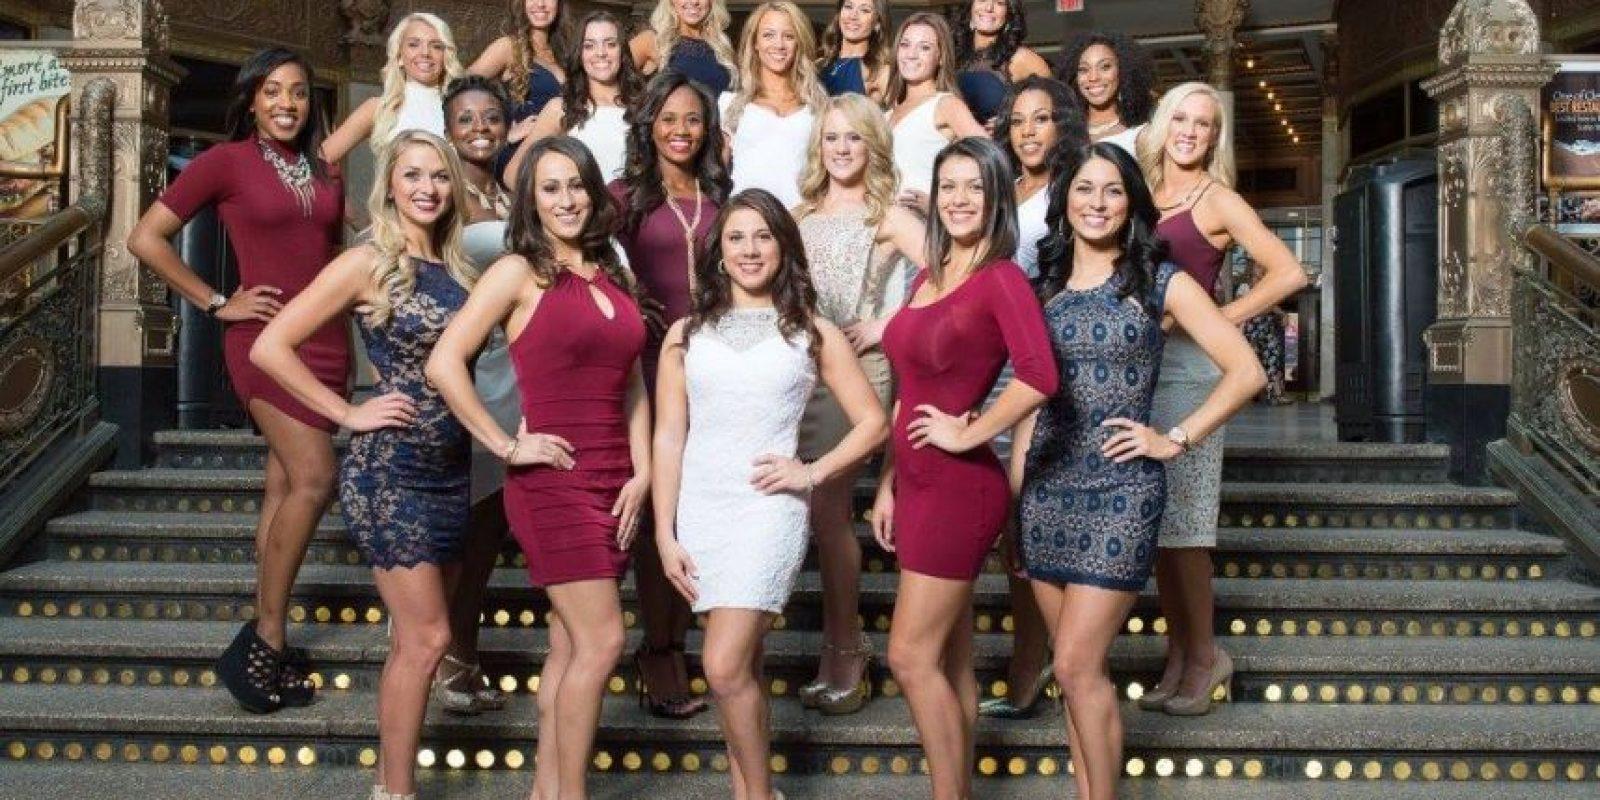 Cleveland Cavaliers Girls Foto:NBA